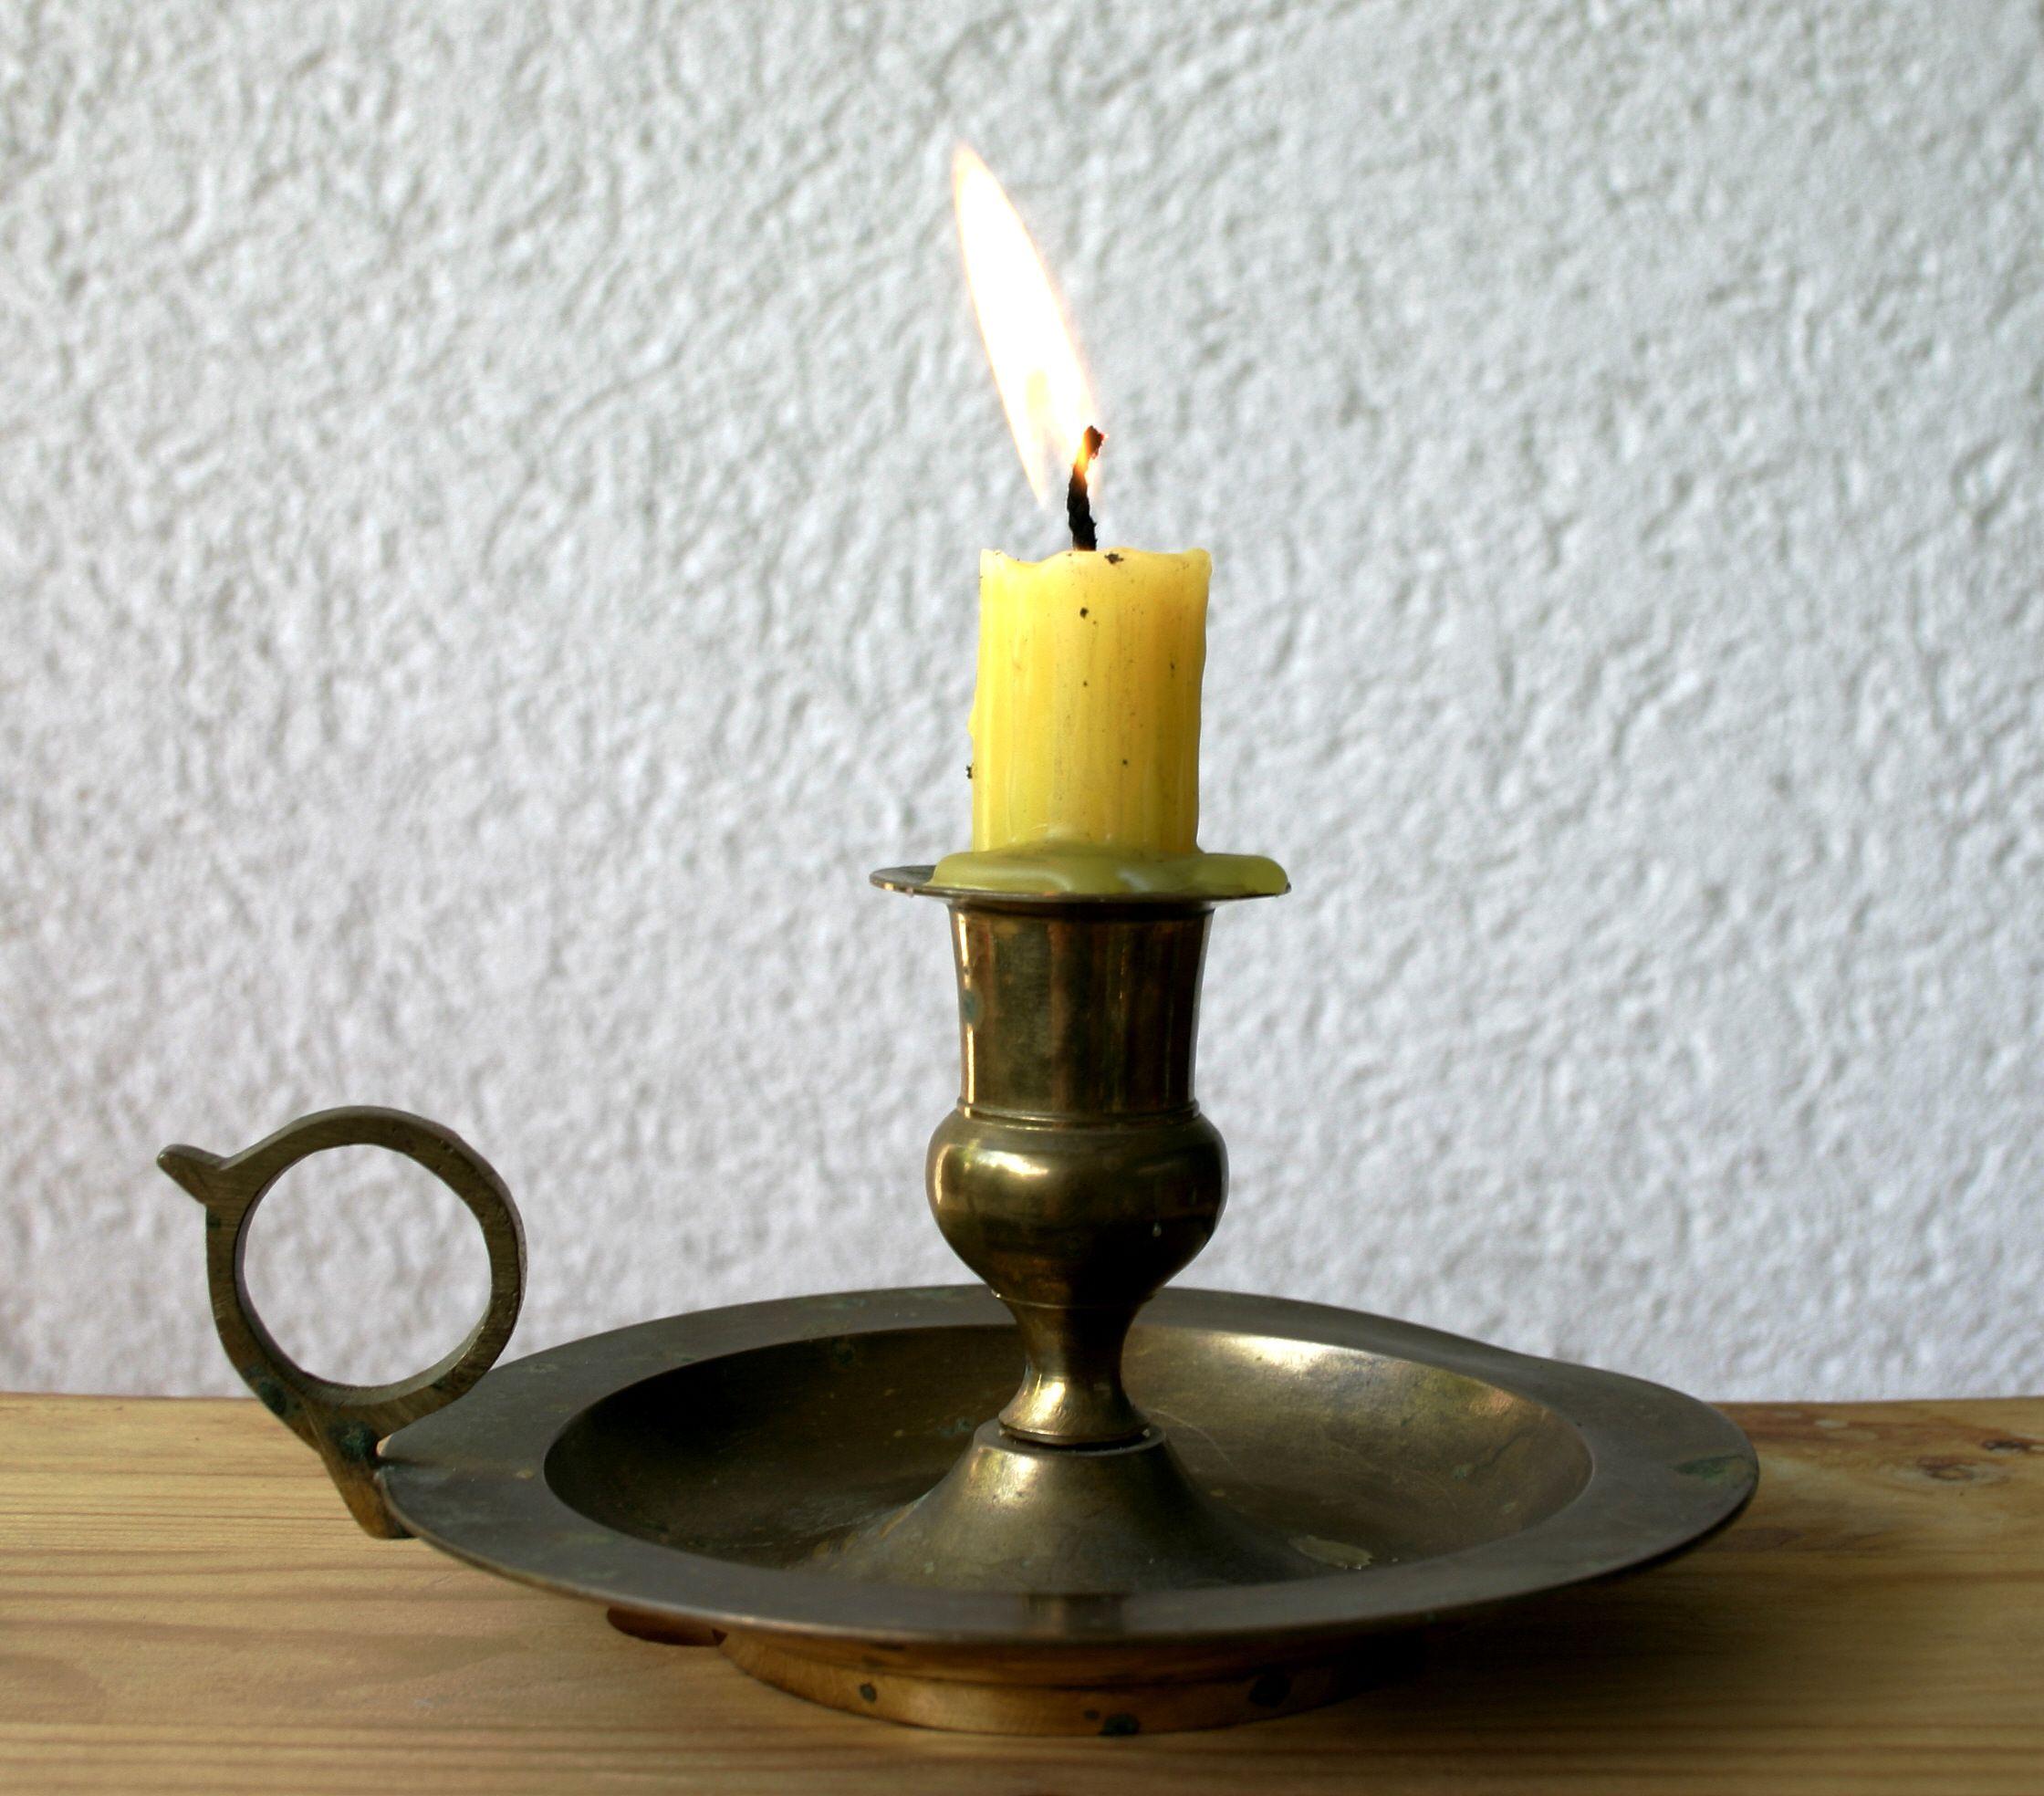 свечи с подсвечниками картинки обожает жару